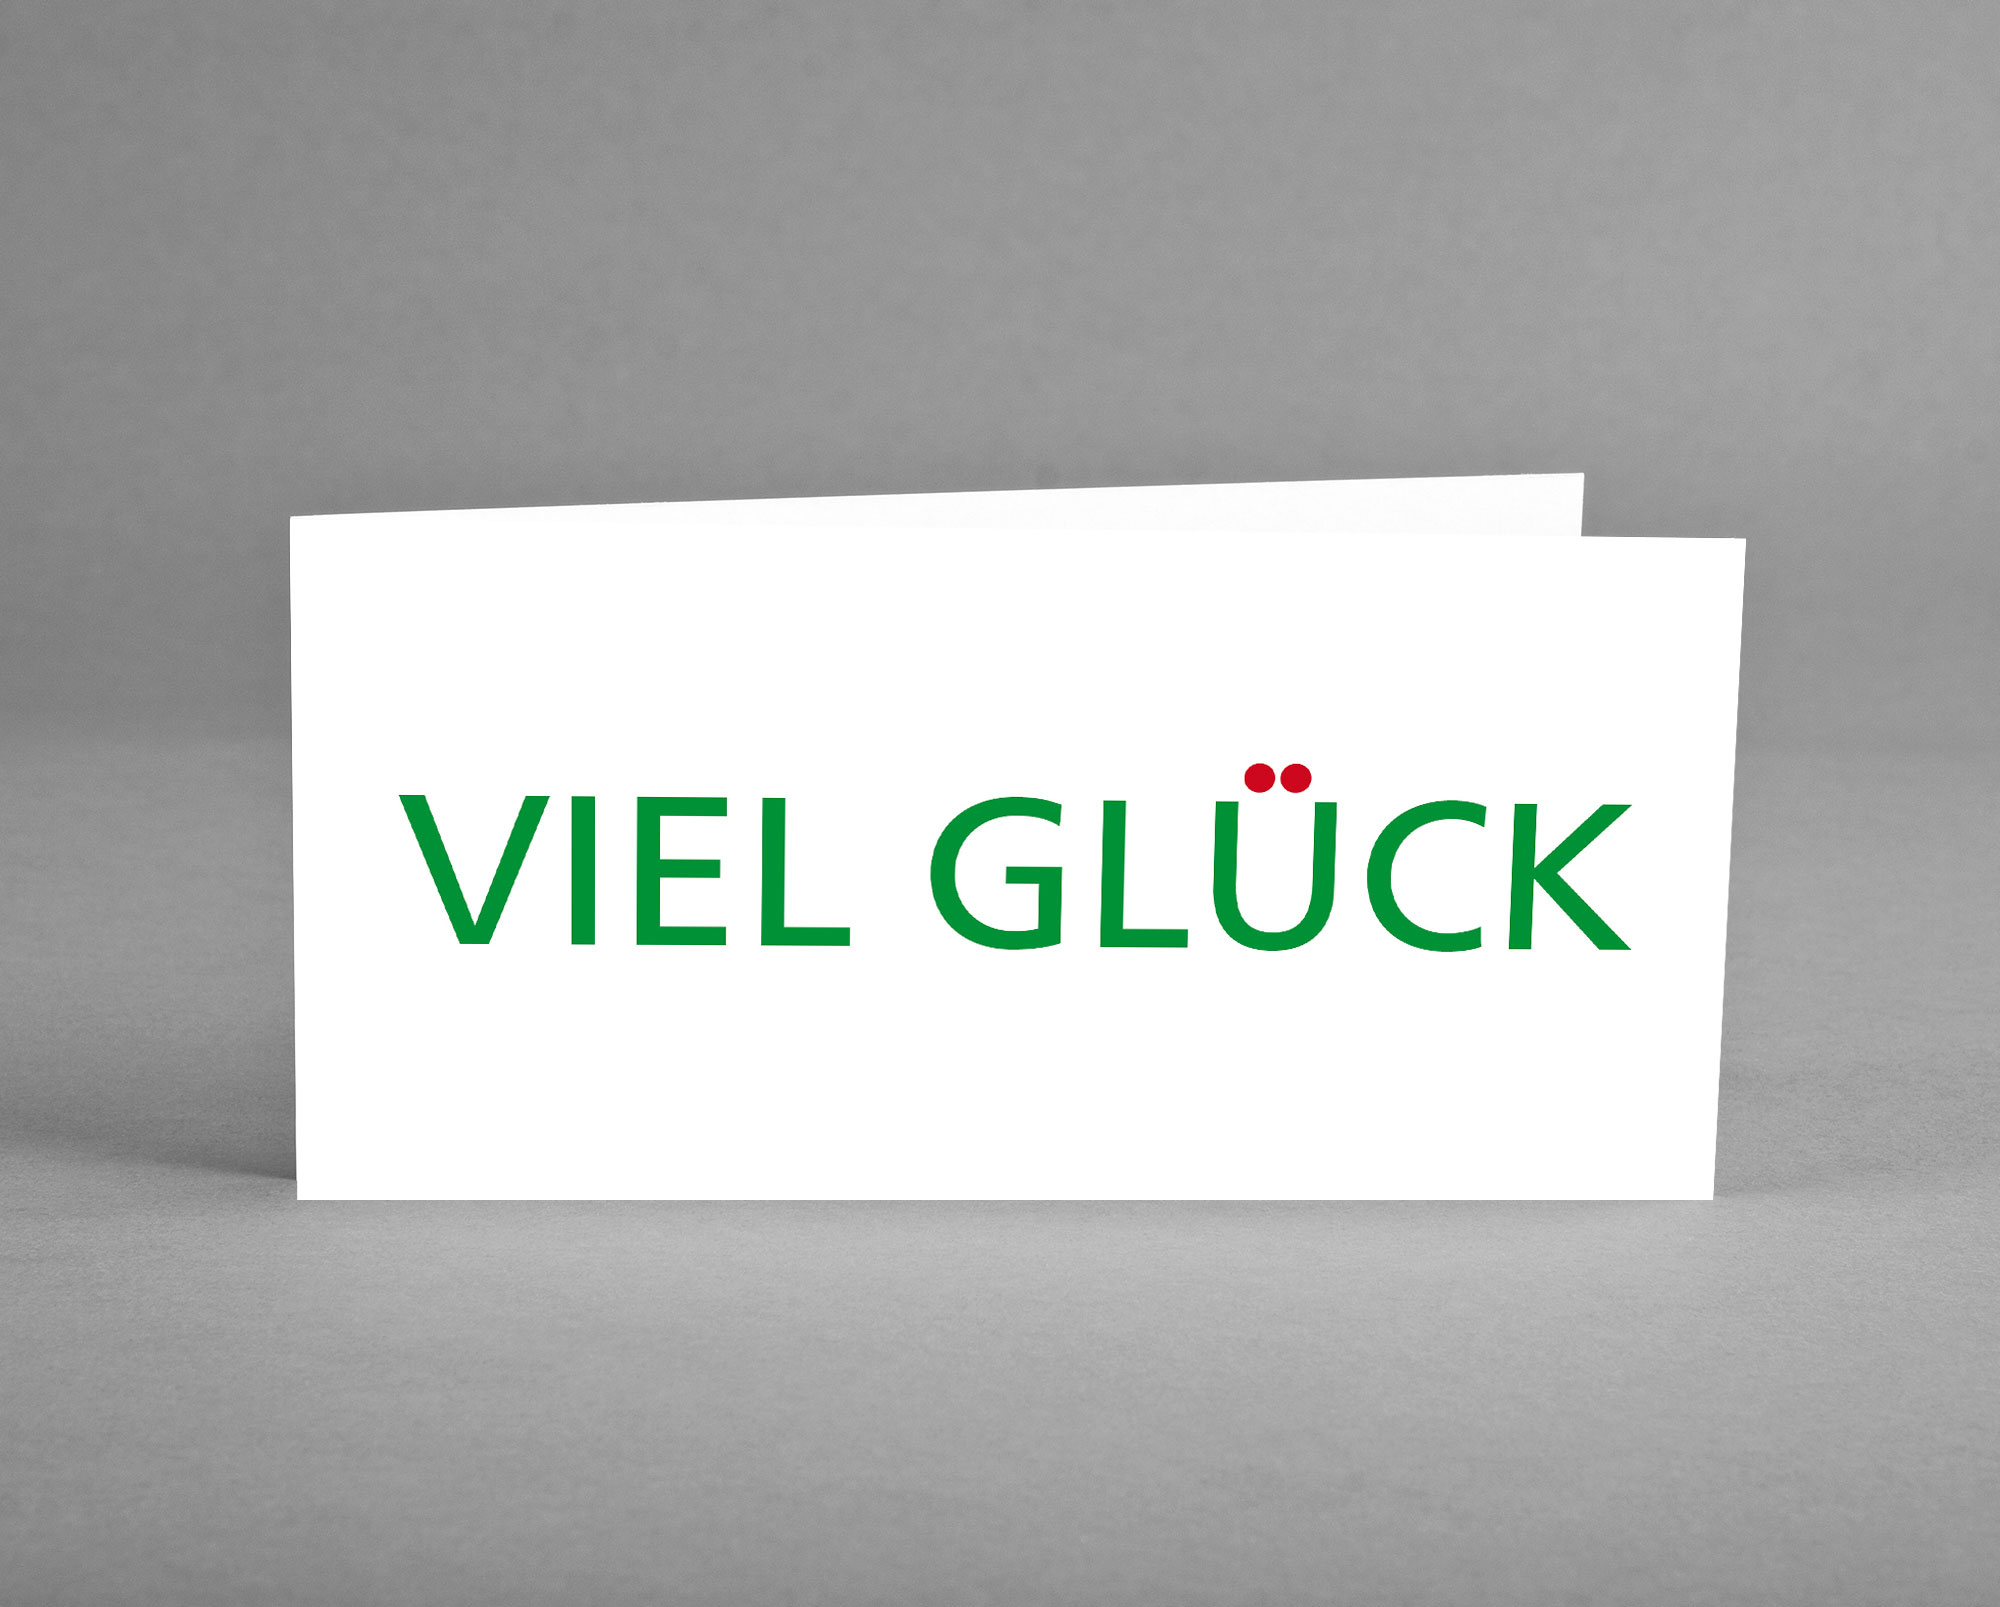 Gl-ckwunschkarte_Viel-Gl-ck_grusskarten-design_aussencQSZ1ZiJMLWxh